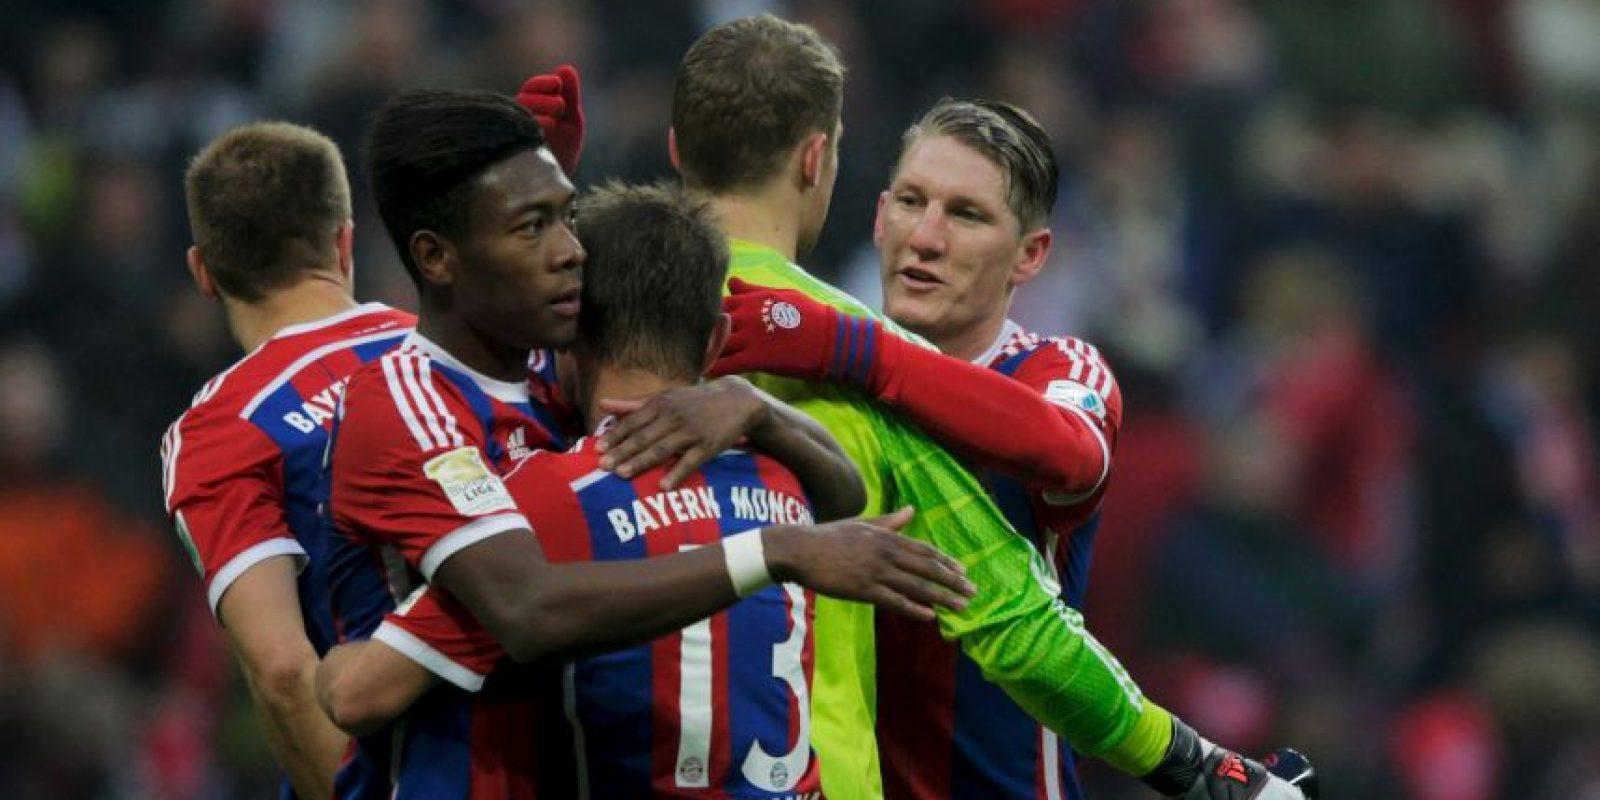 Se ve las caras con Bayern Múnich Foto:Getty